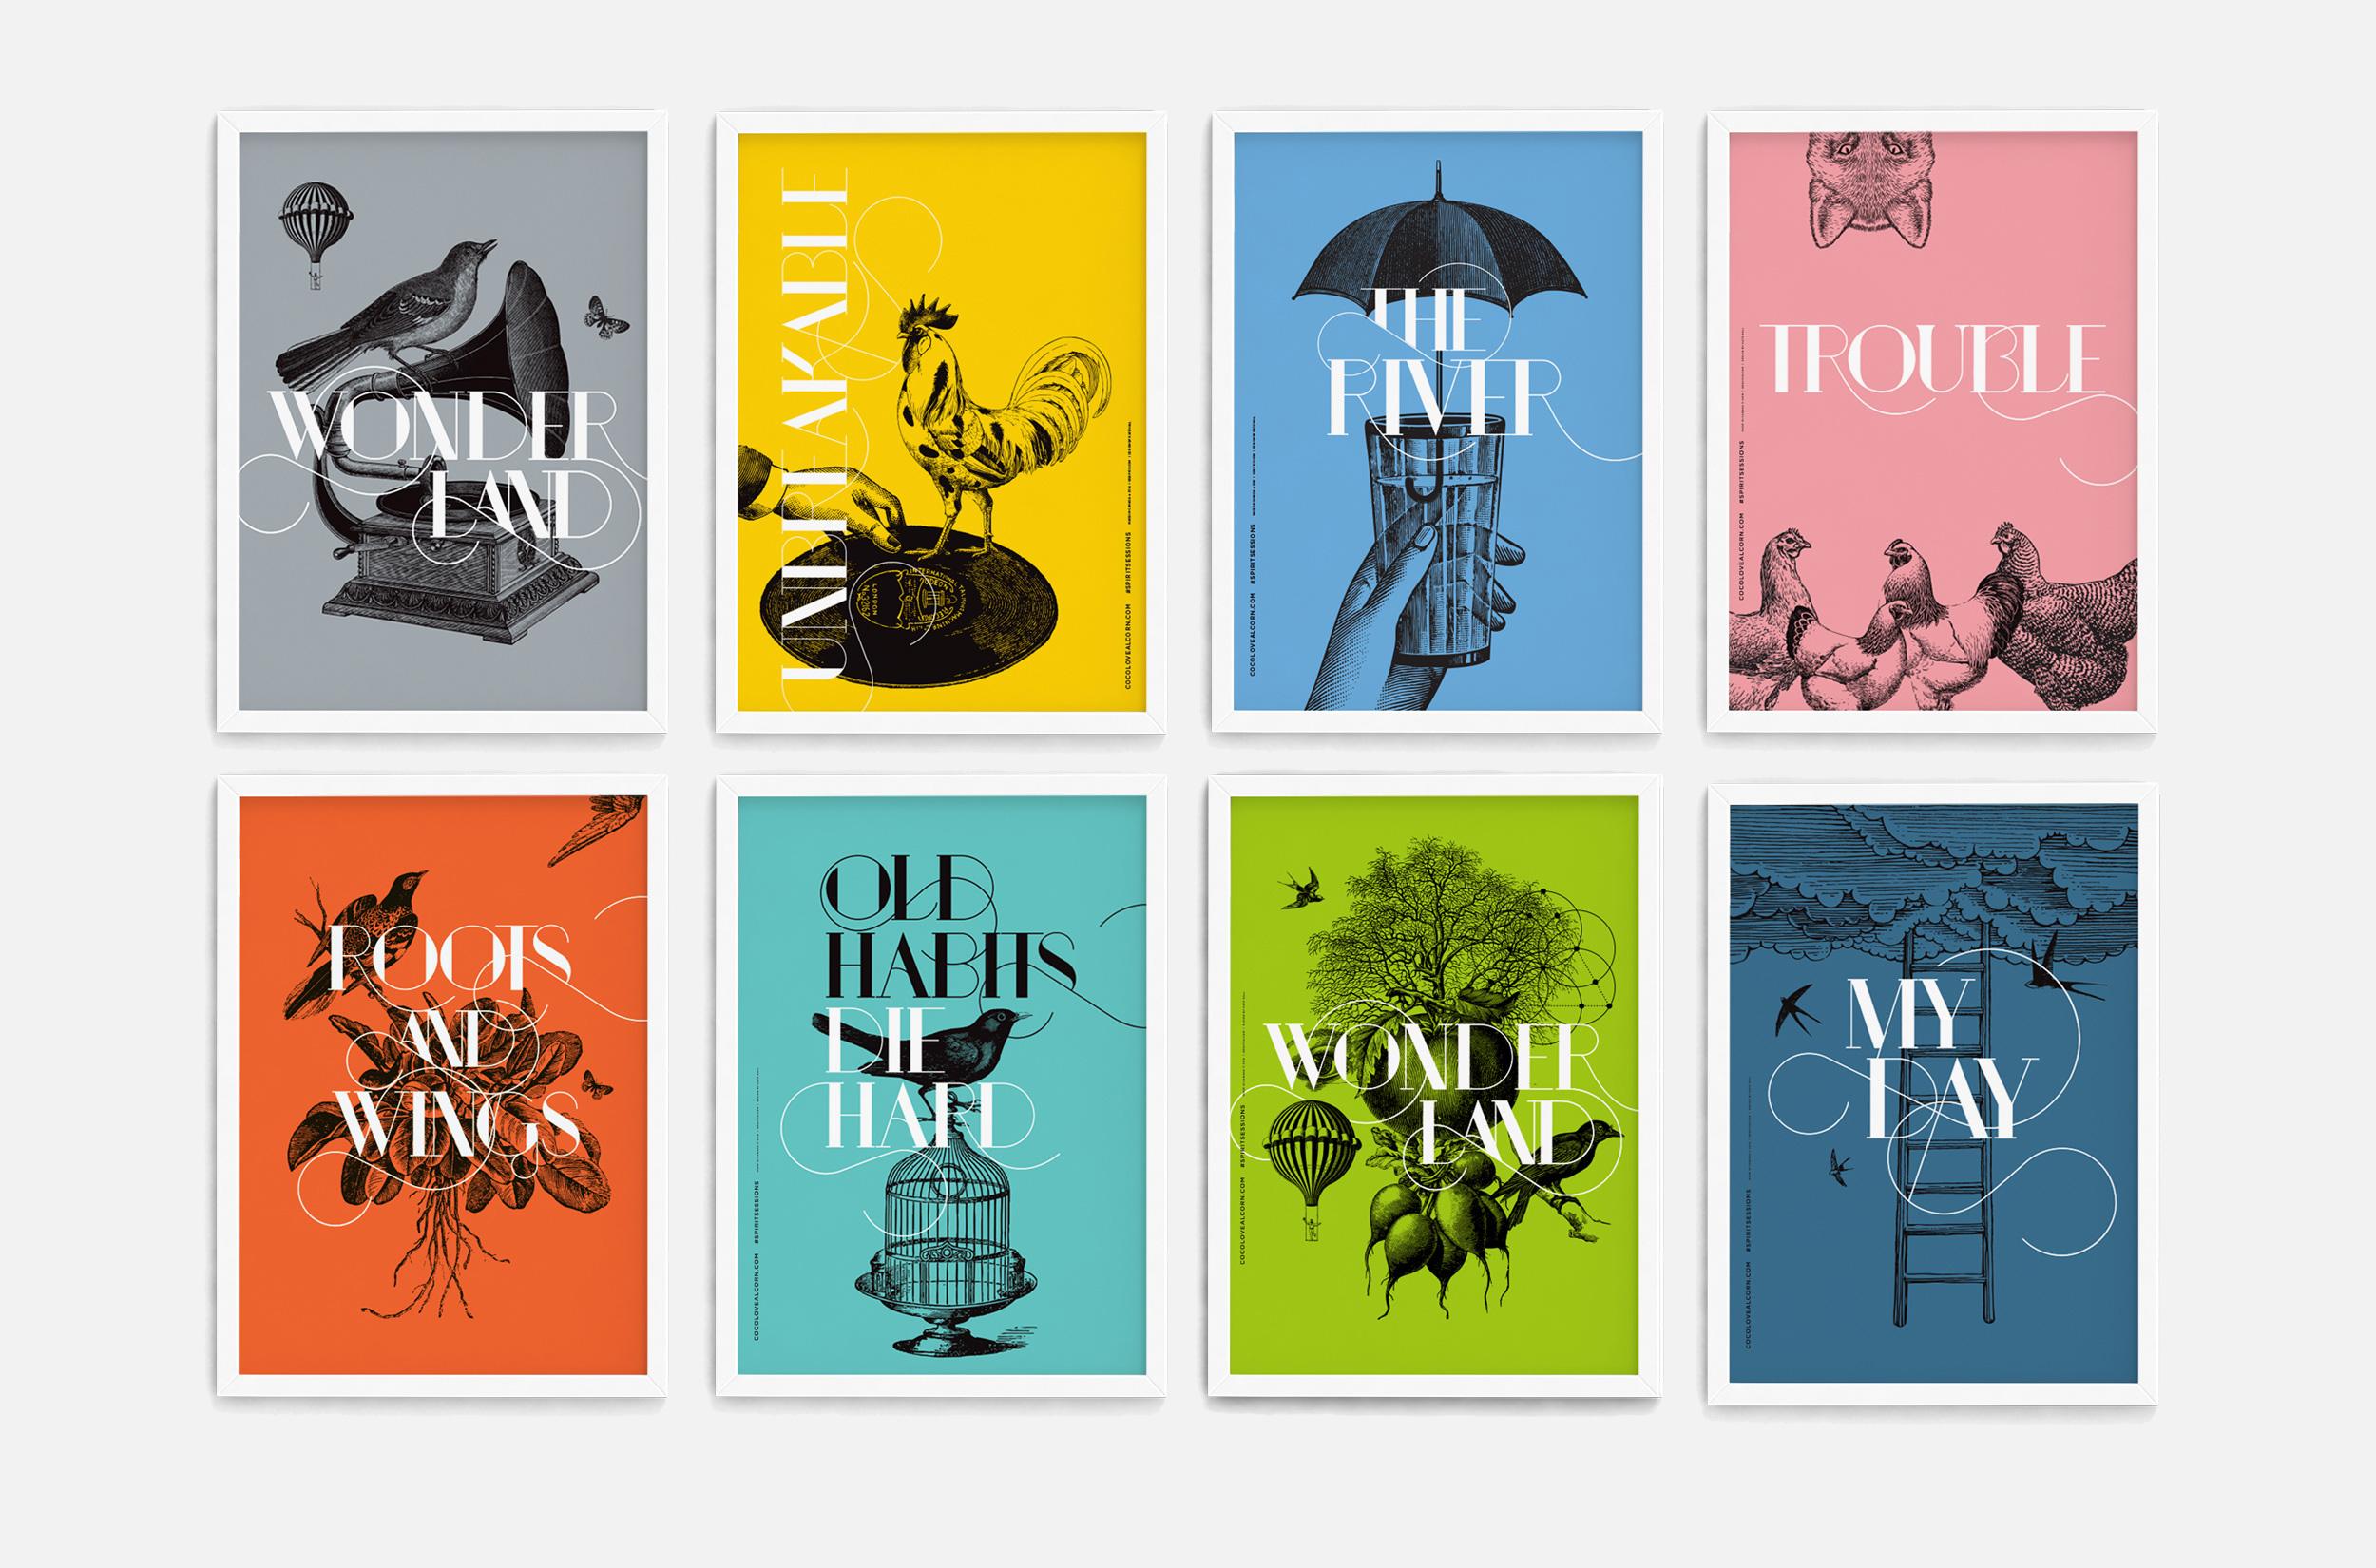 Wonderland-posters7a.jpg